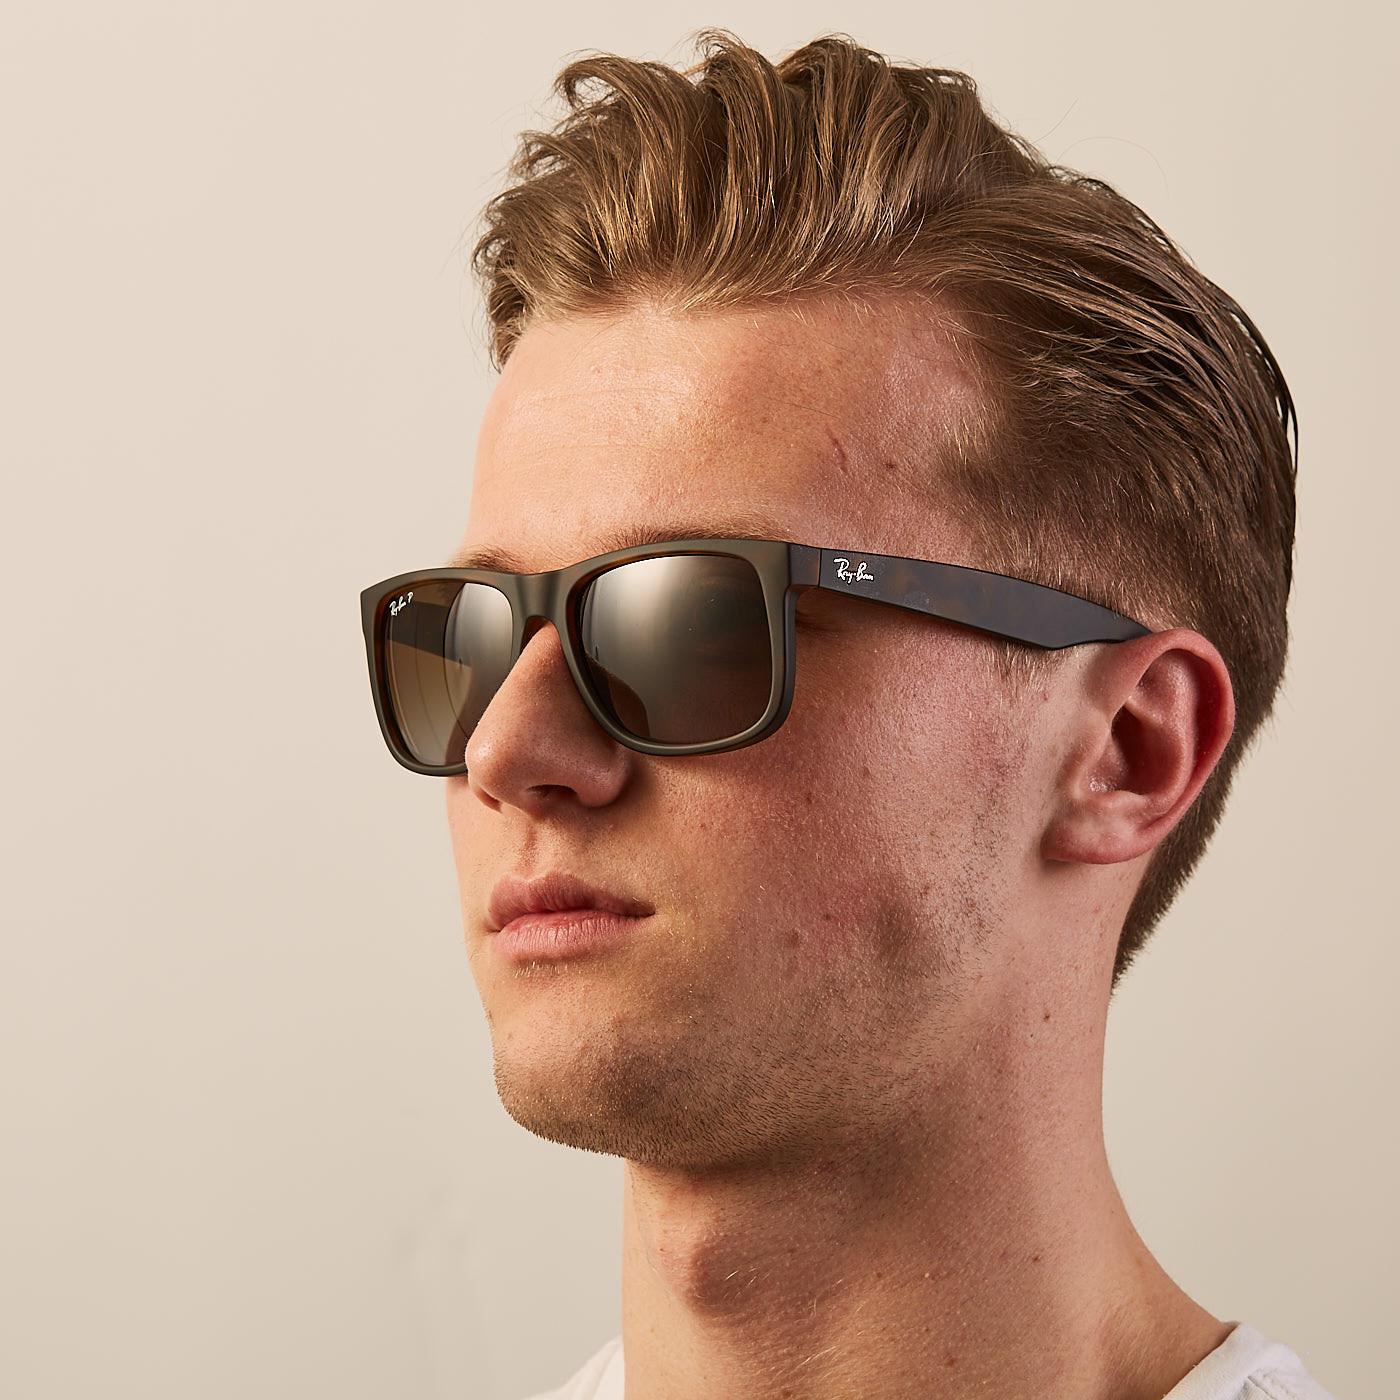 494bdc03e89f50 Ray-Ban Justin Polarized RB4165865T555 - Sunglasses